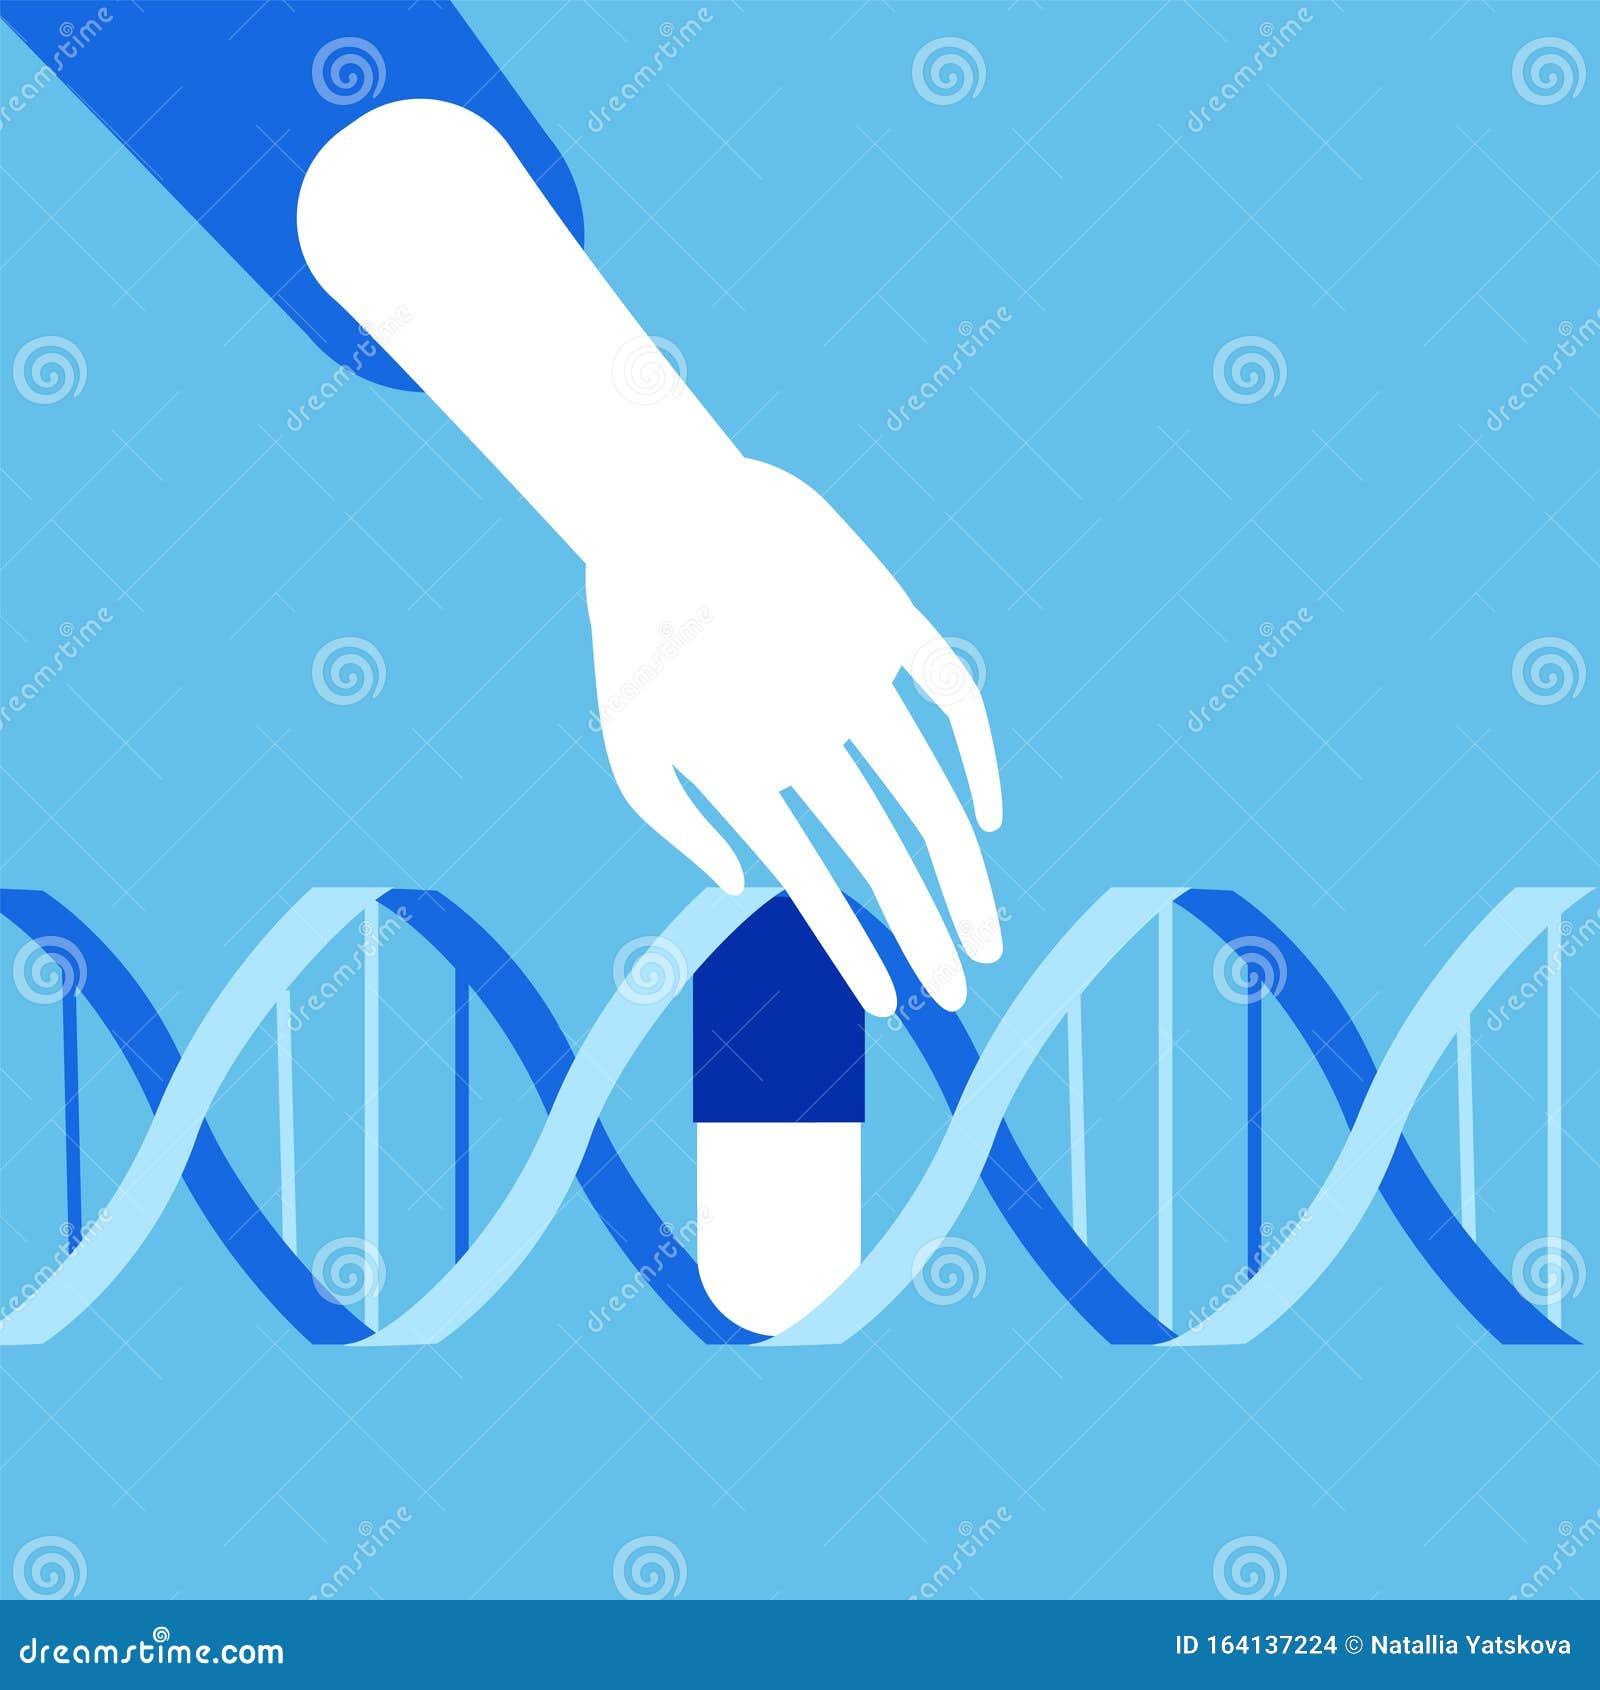 cancer genetic engineering)